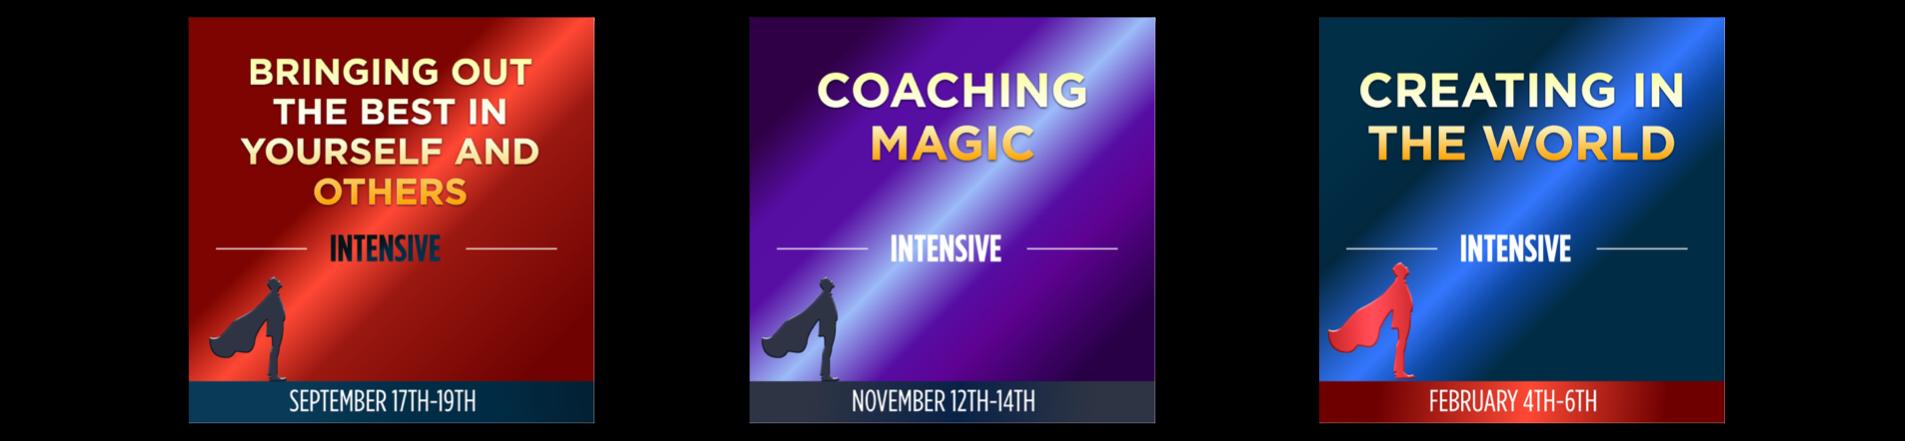 Coaching_Intensives